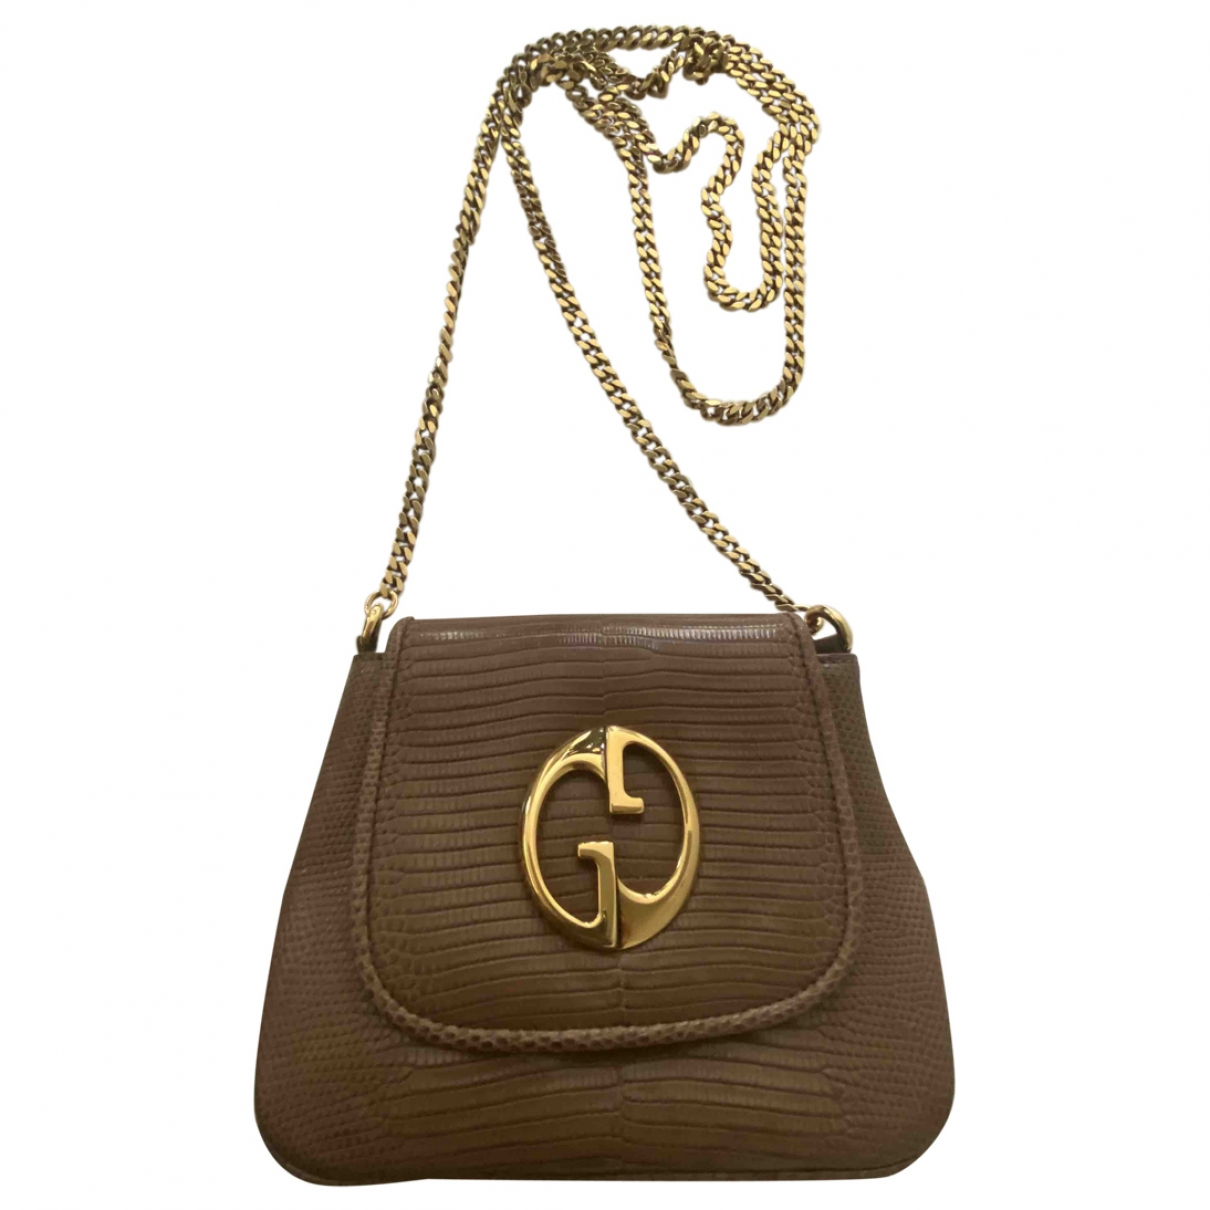 Gucci - Sac a main 1973 pour femme en lezard - marron